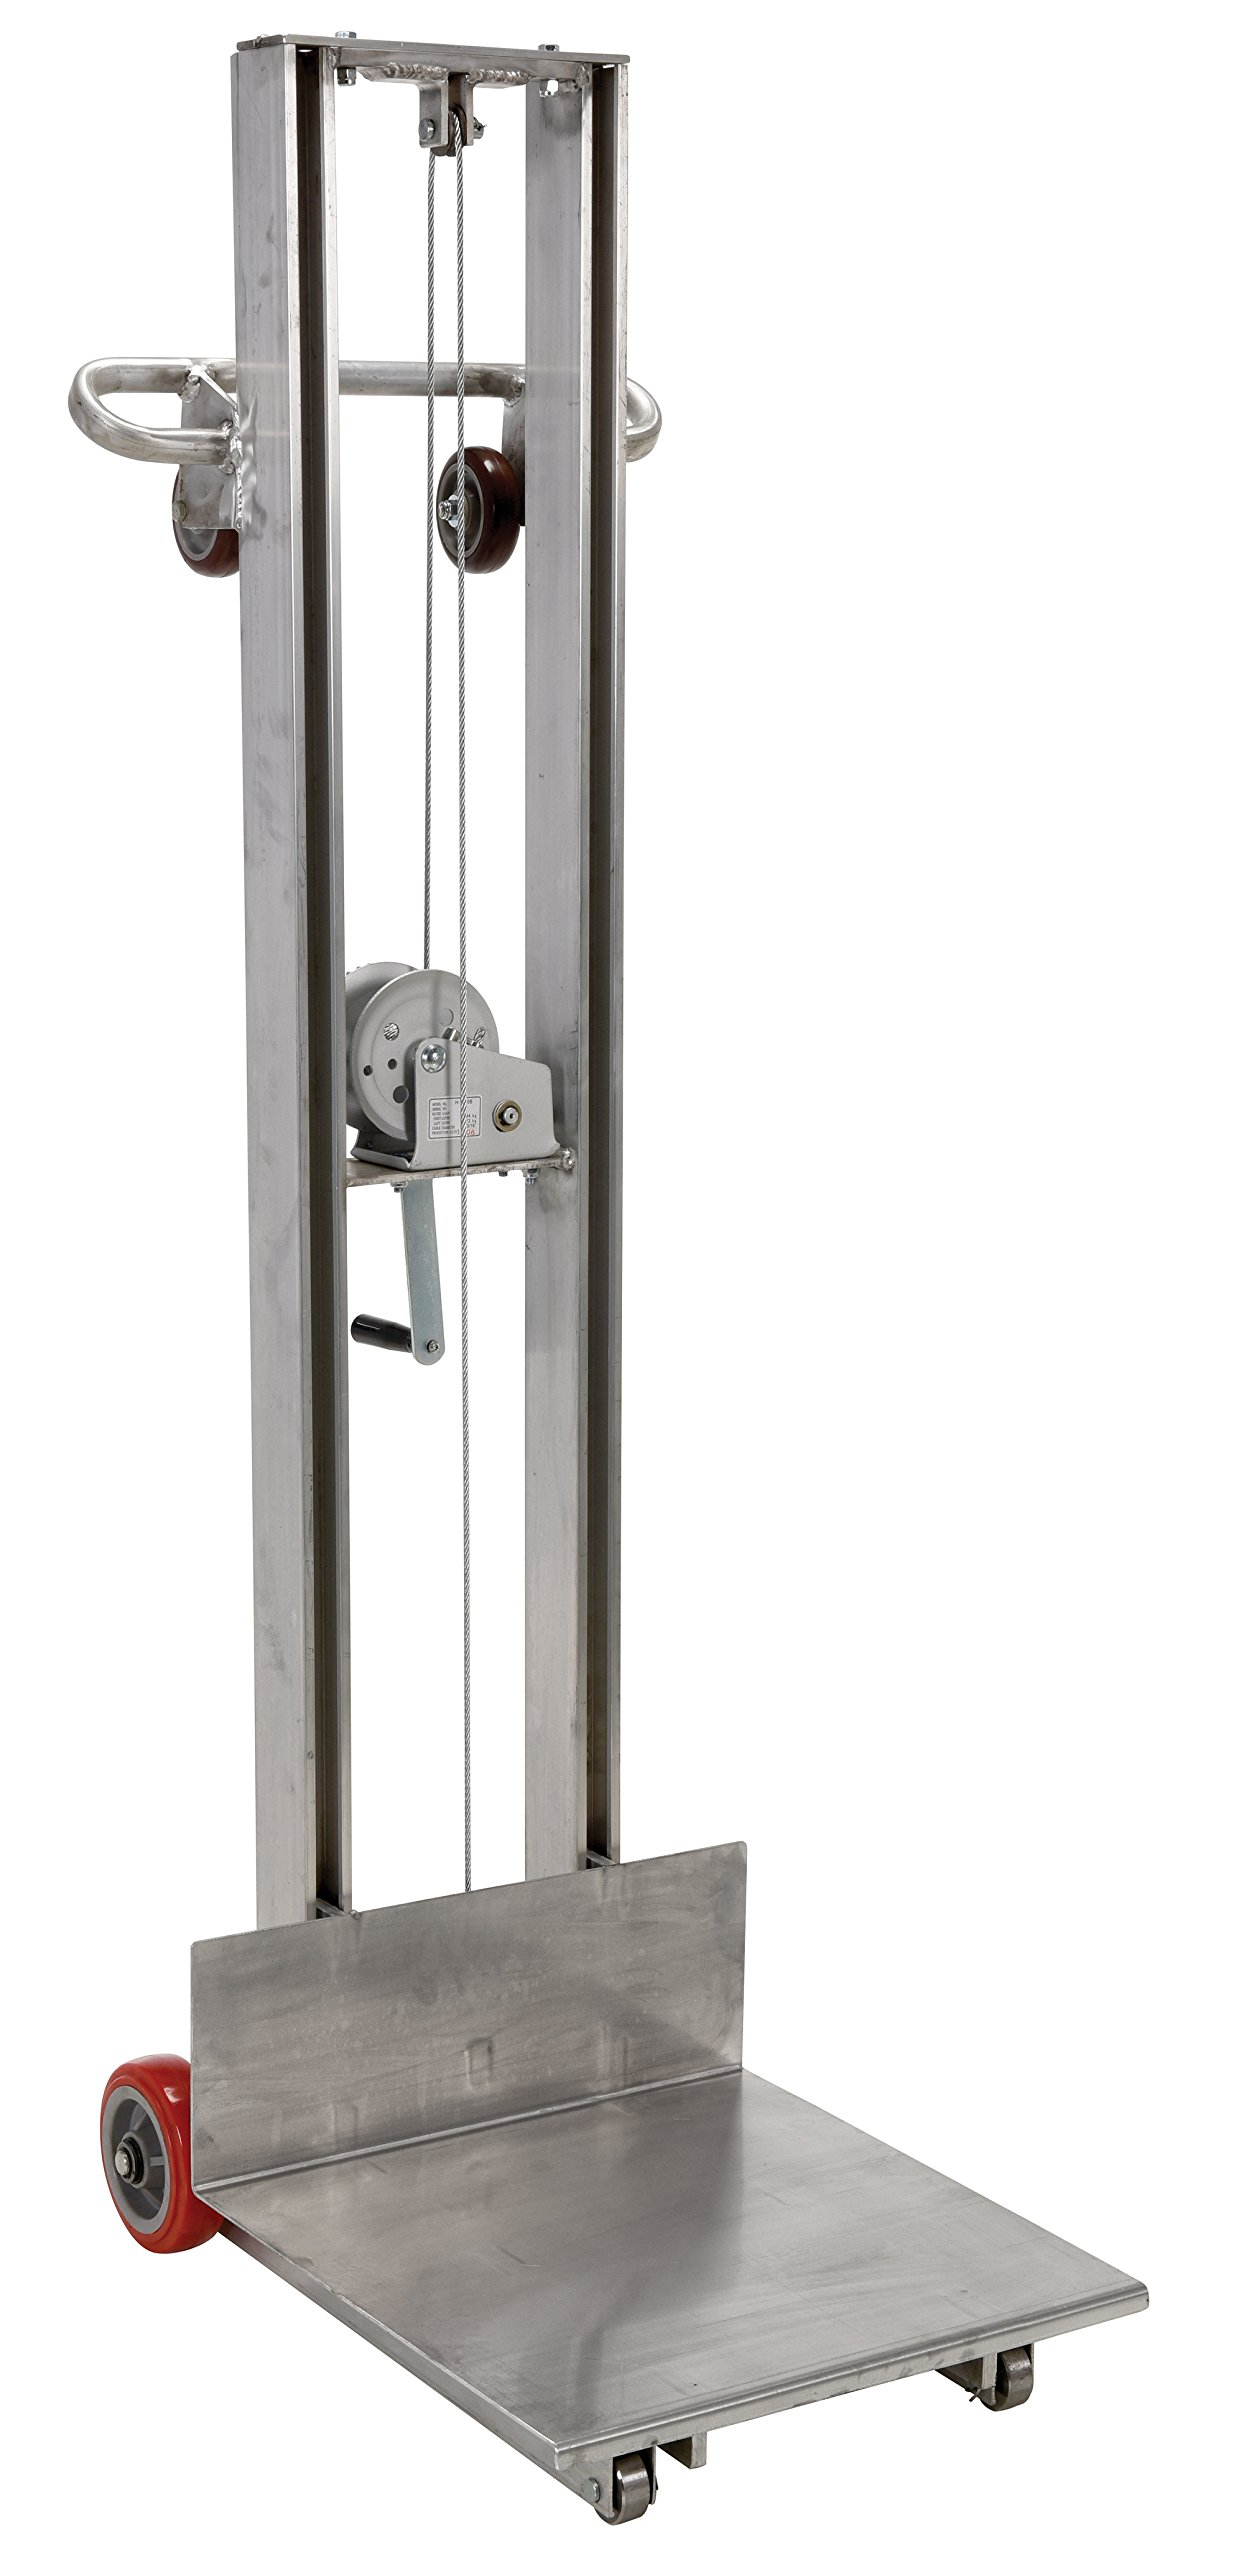 Vestil ALLW-2020-FW Aluminum Lite Load Lift Winch, 3-1/4'' - 58'' Height Range, 20'' Length x 20'' Width Platform, 400 lbs Capacity